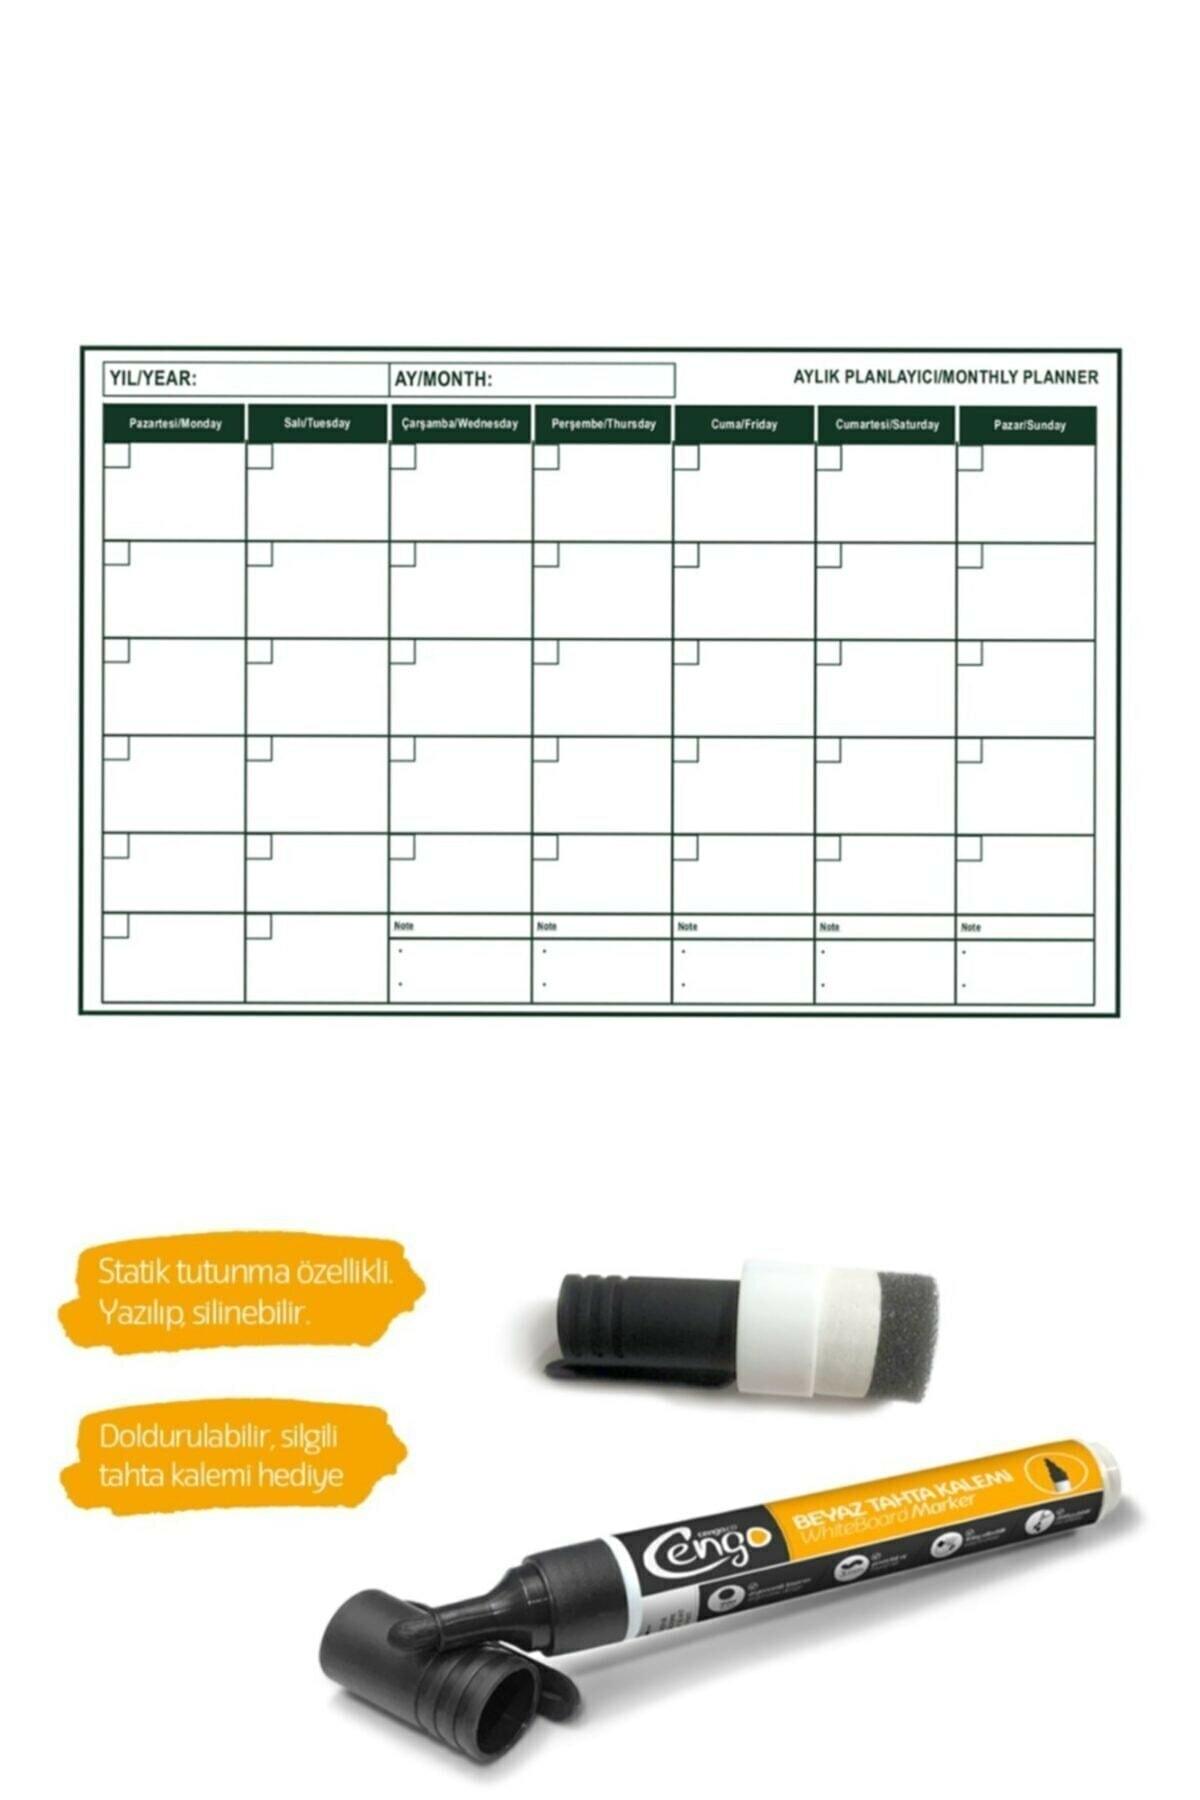 CNZ Pratik Mini Aylık Plan Çizelgesi -56x85 Cm Kağıt Tahta ( 2 Adet Silgili Kalem Hediye ) 1